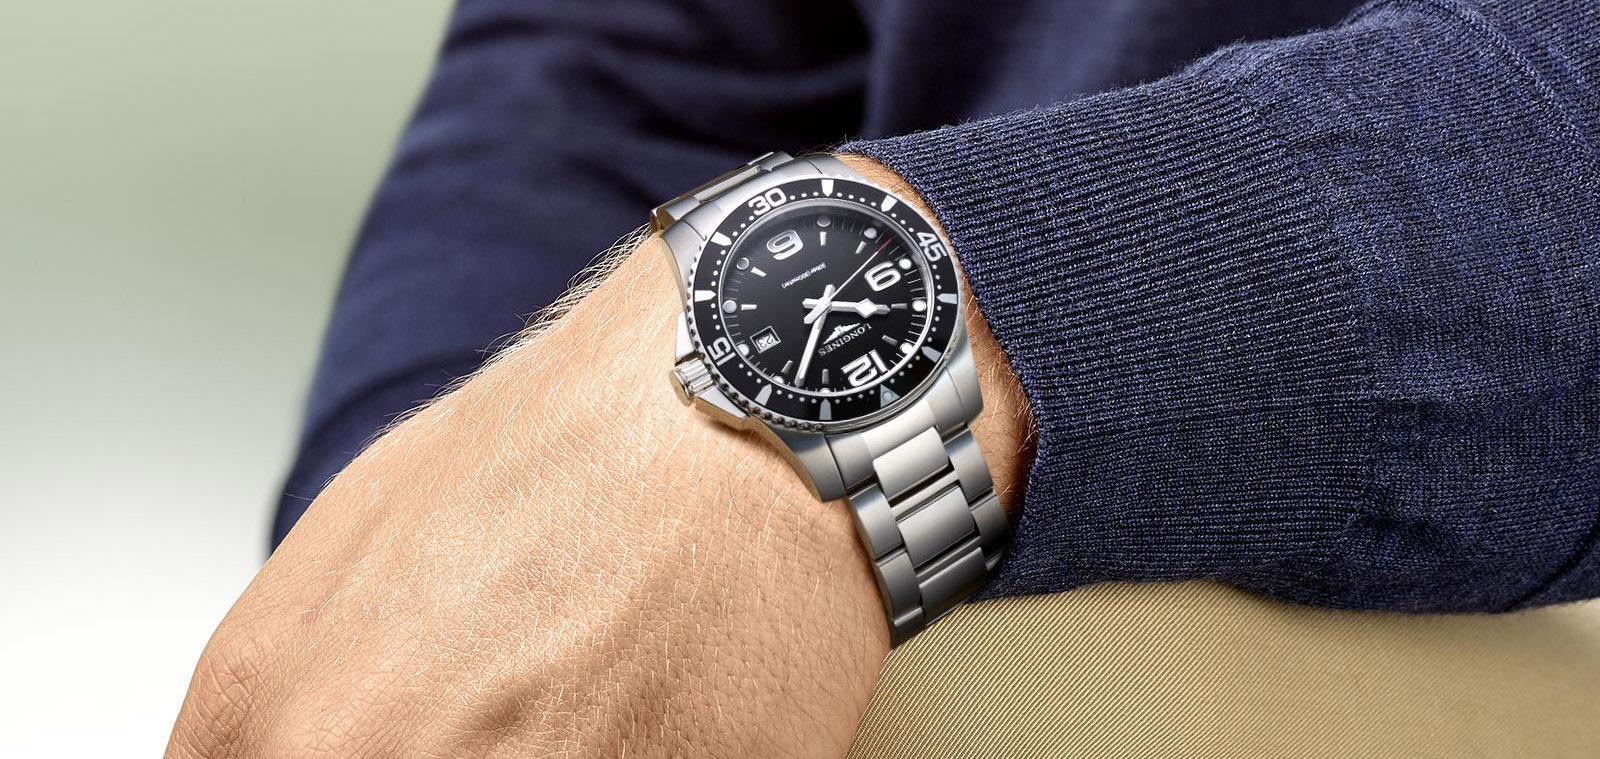 Ontdek hier horloges van het Zwitserse merk Longines vanaf €650,-